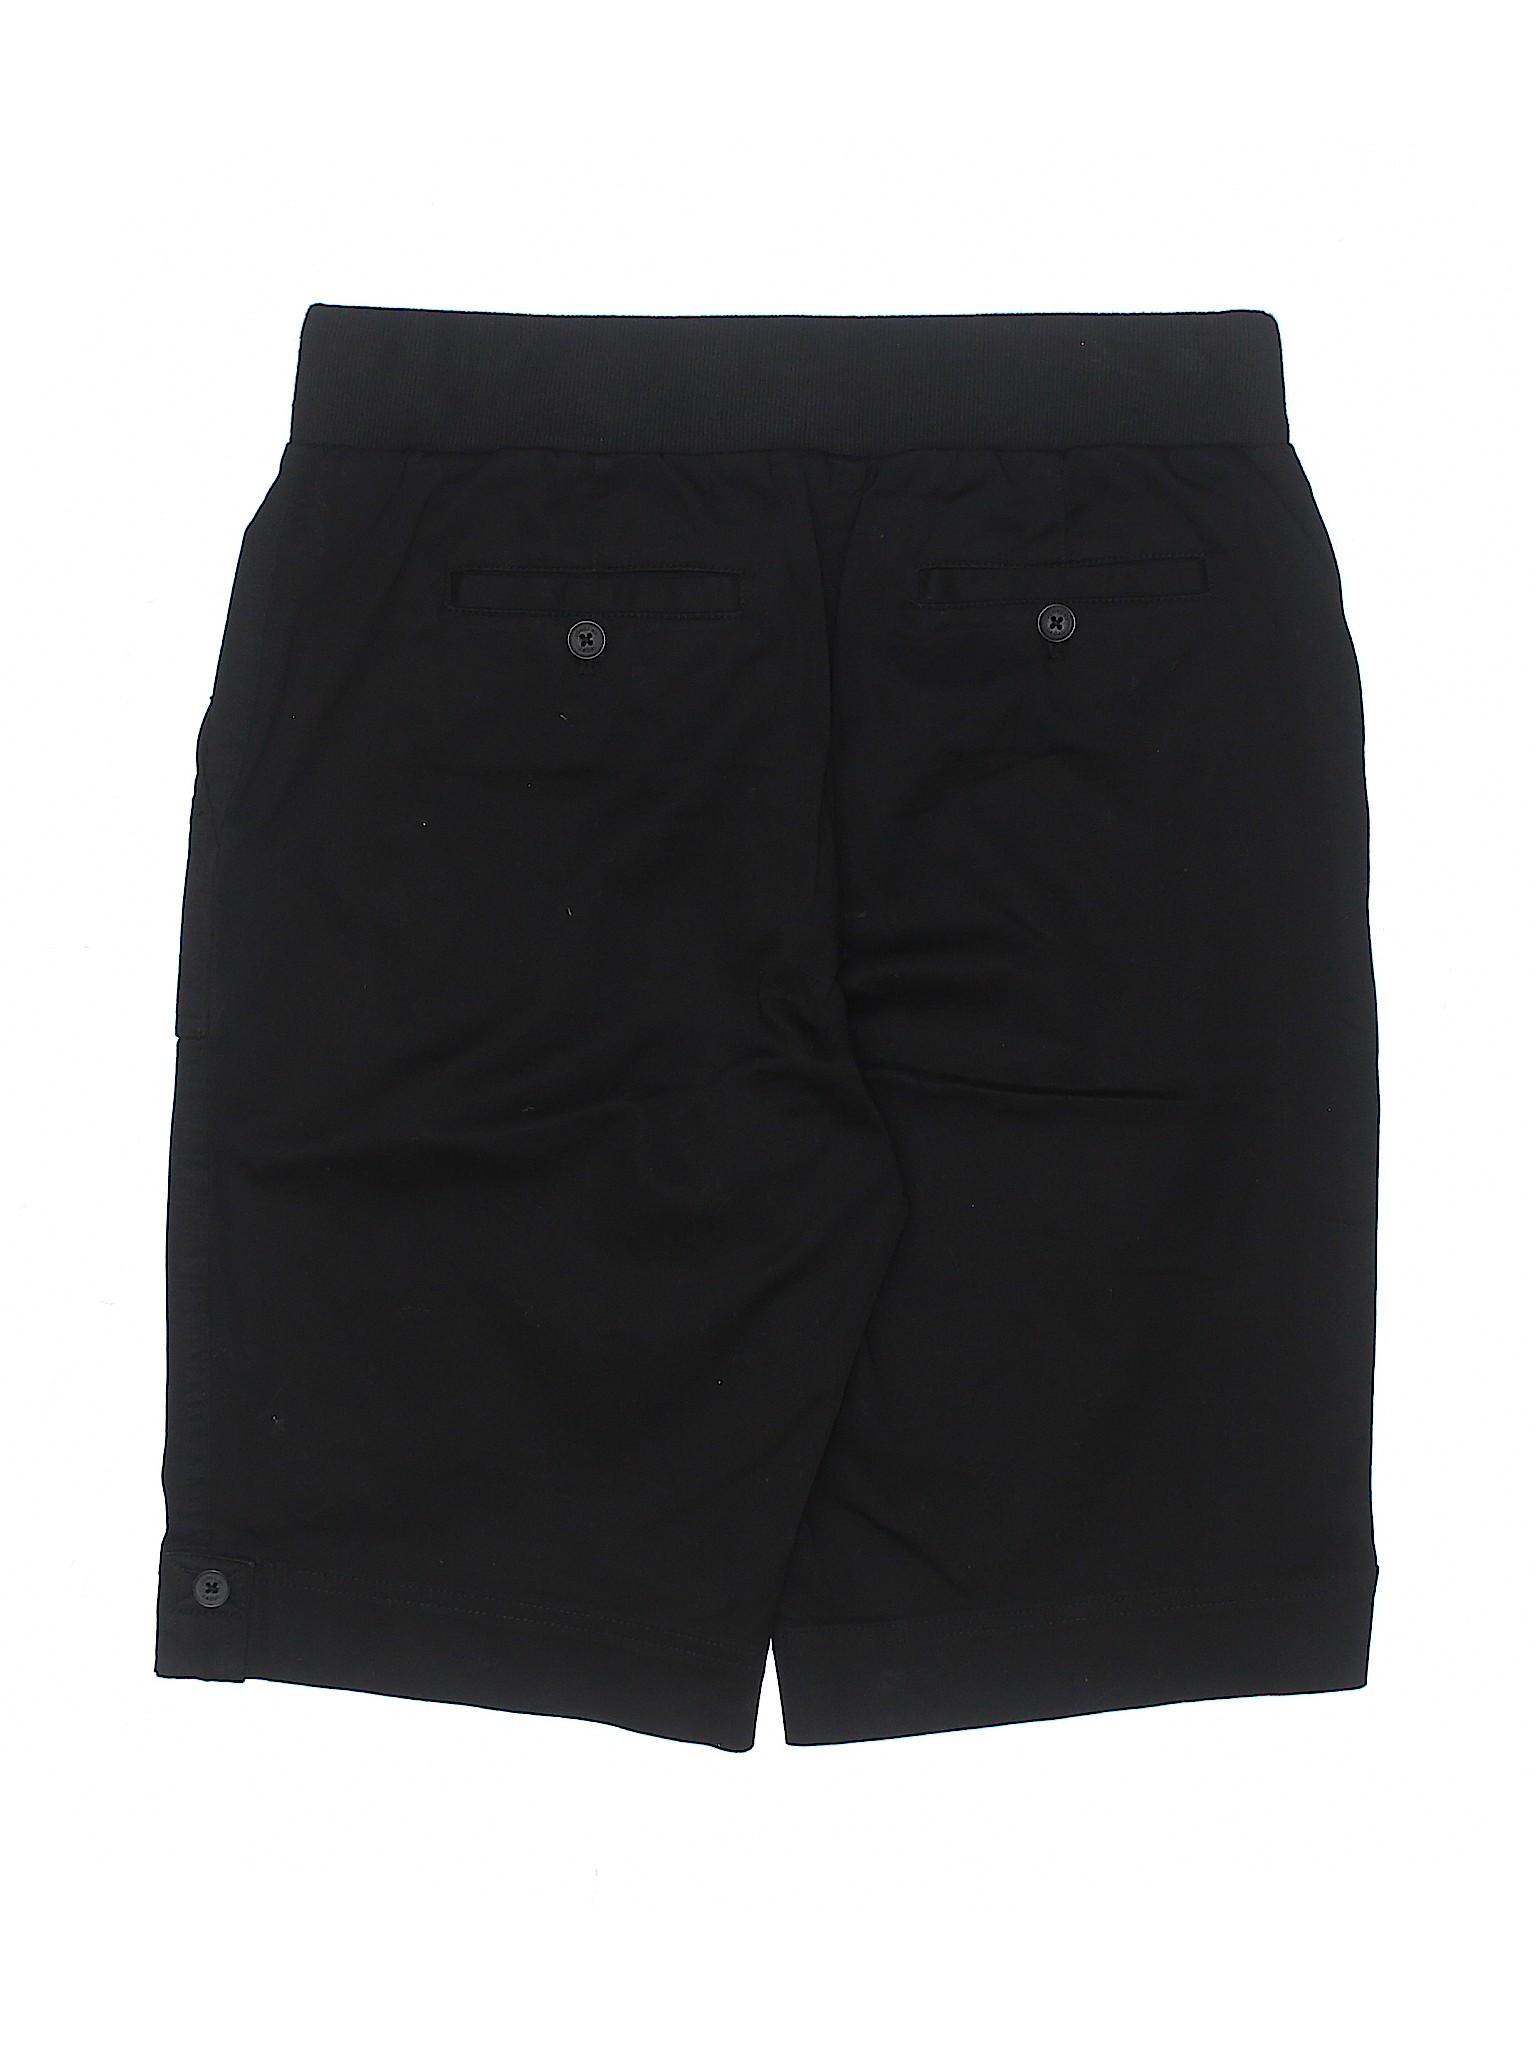 Shorts New York Jones Boutique Boutique New Jones n1WavxY0